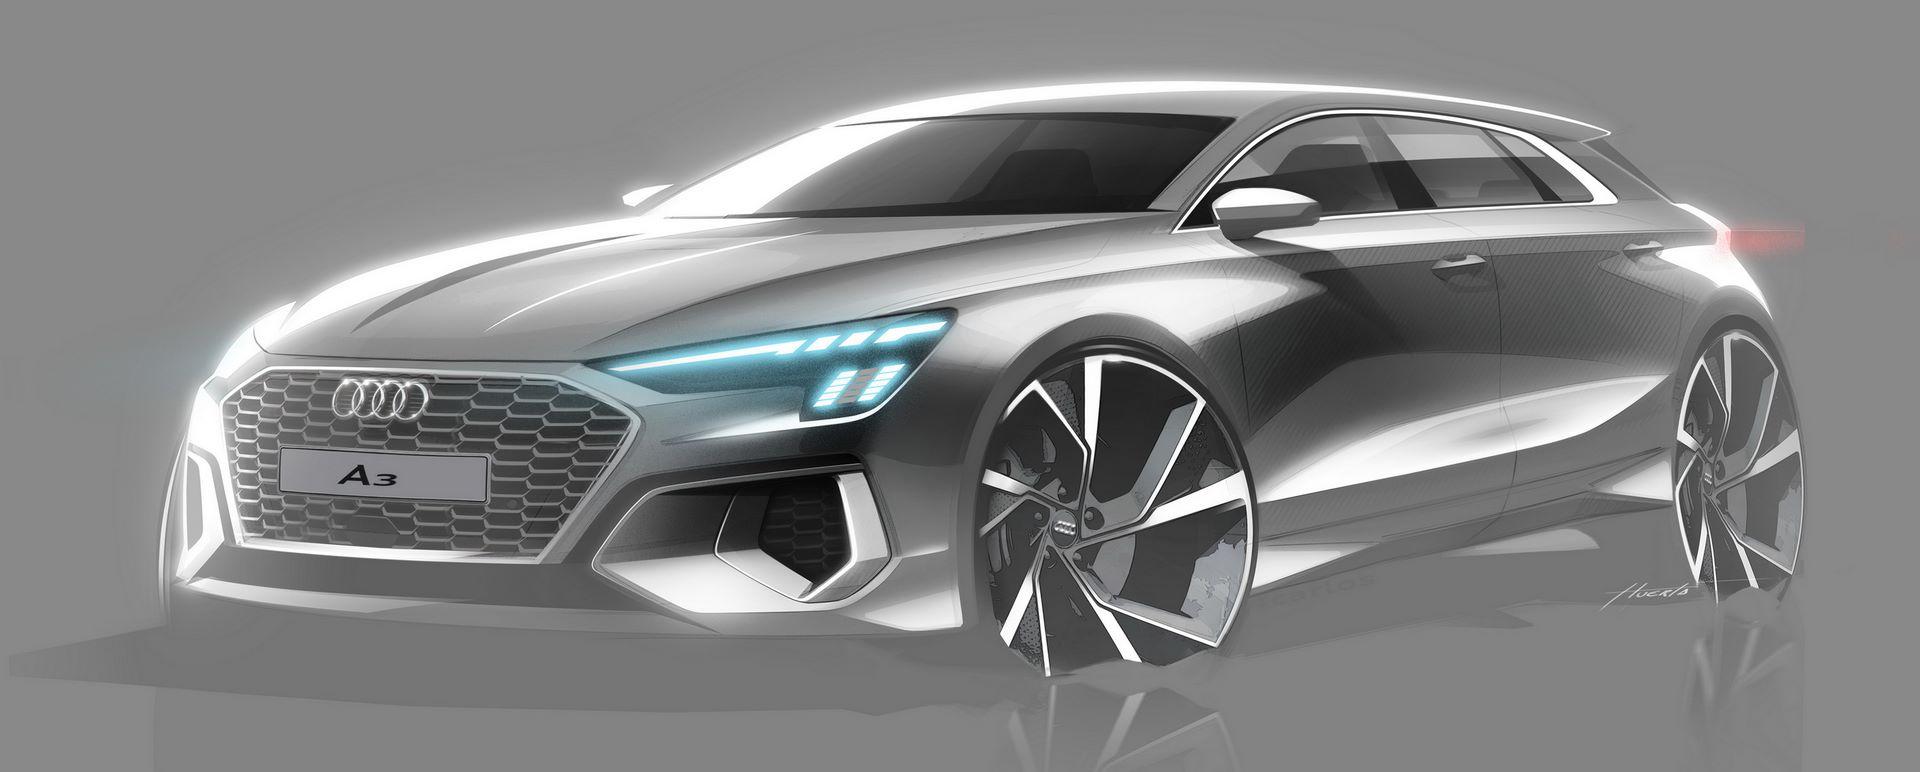 Audi-A3-Sportback-2020-20